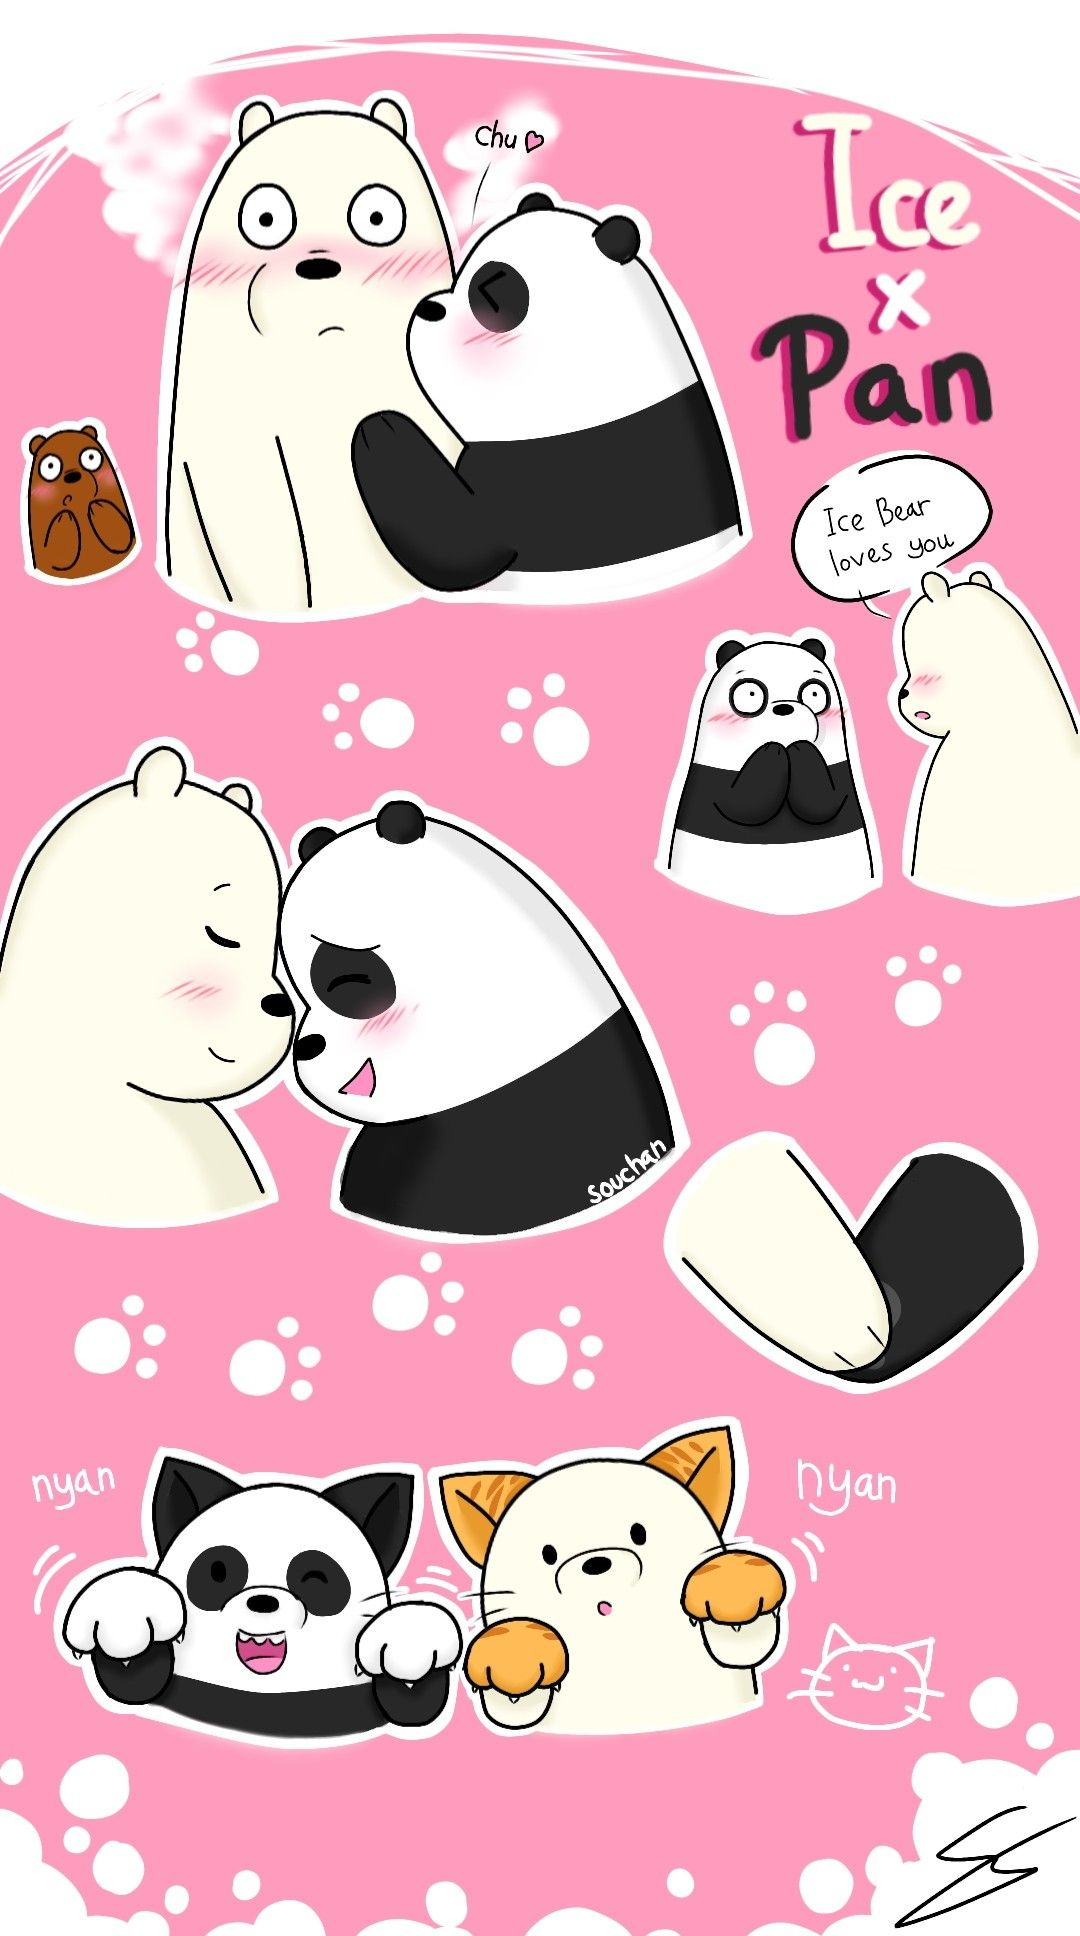 Ice Bear X Panda From Pixiv Ice Bear X Panda We Bare Bears Bare Bears